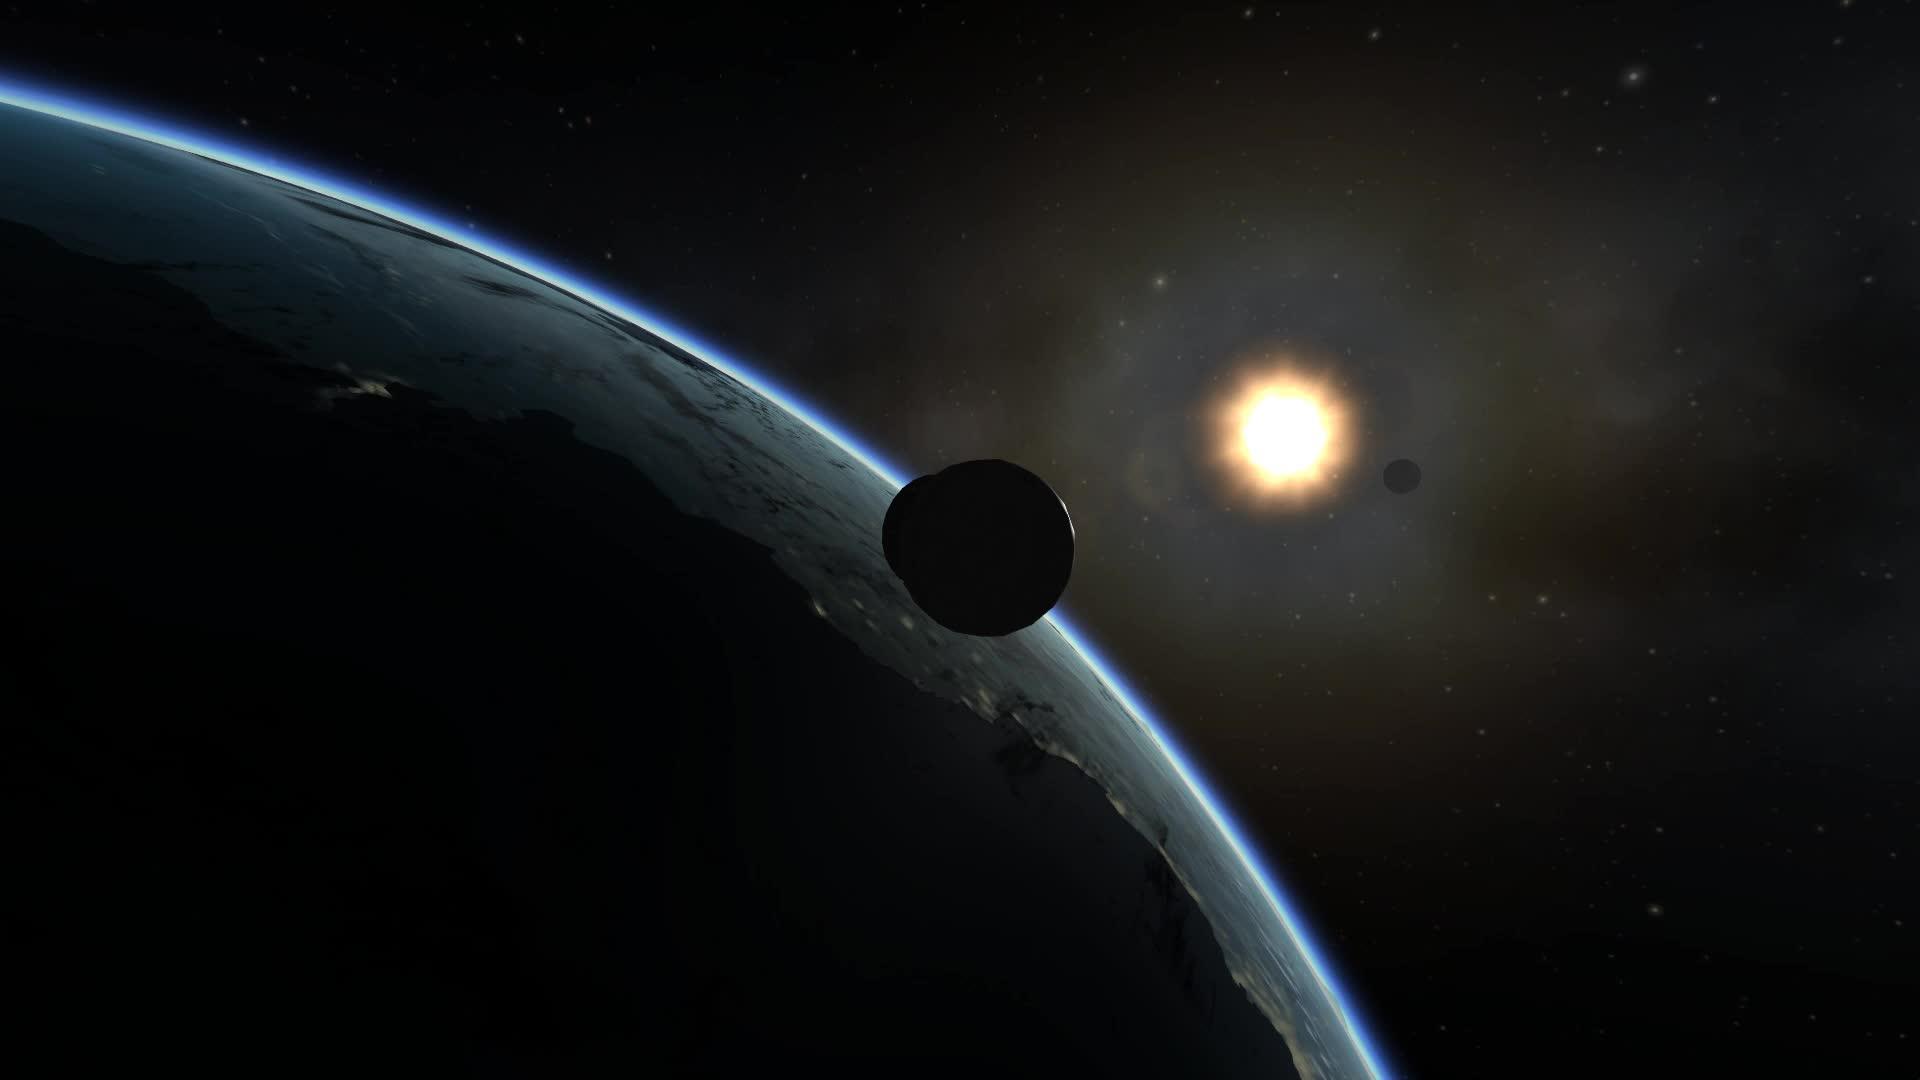 Kerbal Space Program - Fizz GIFs